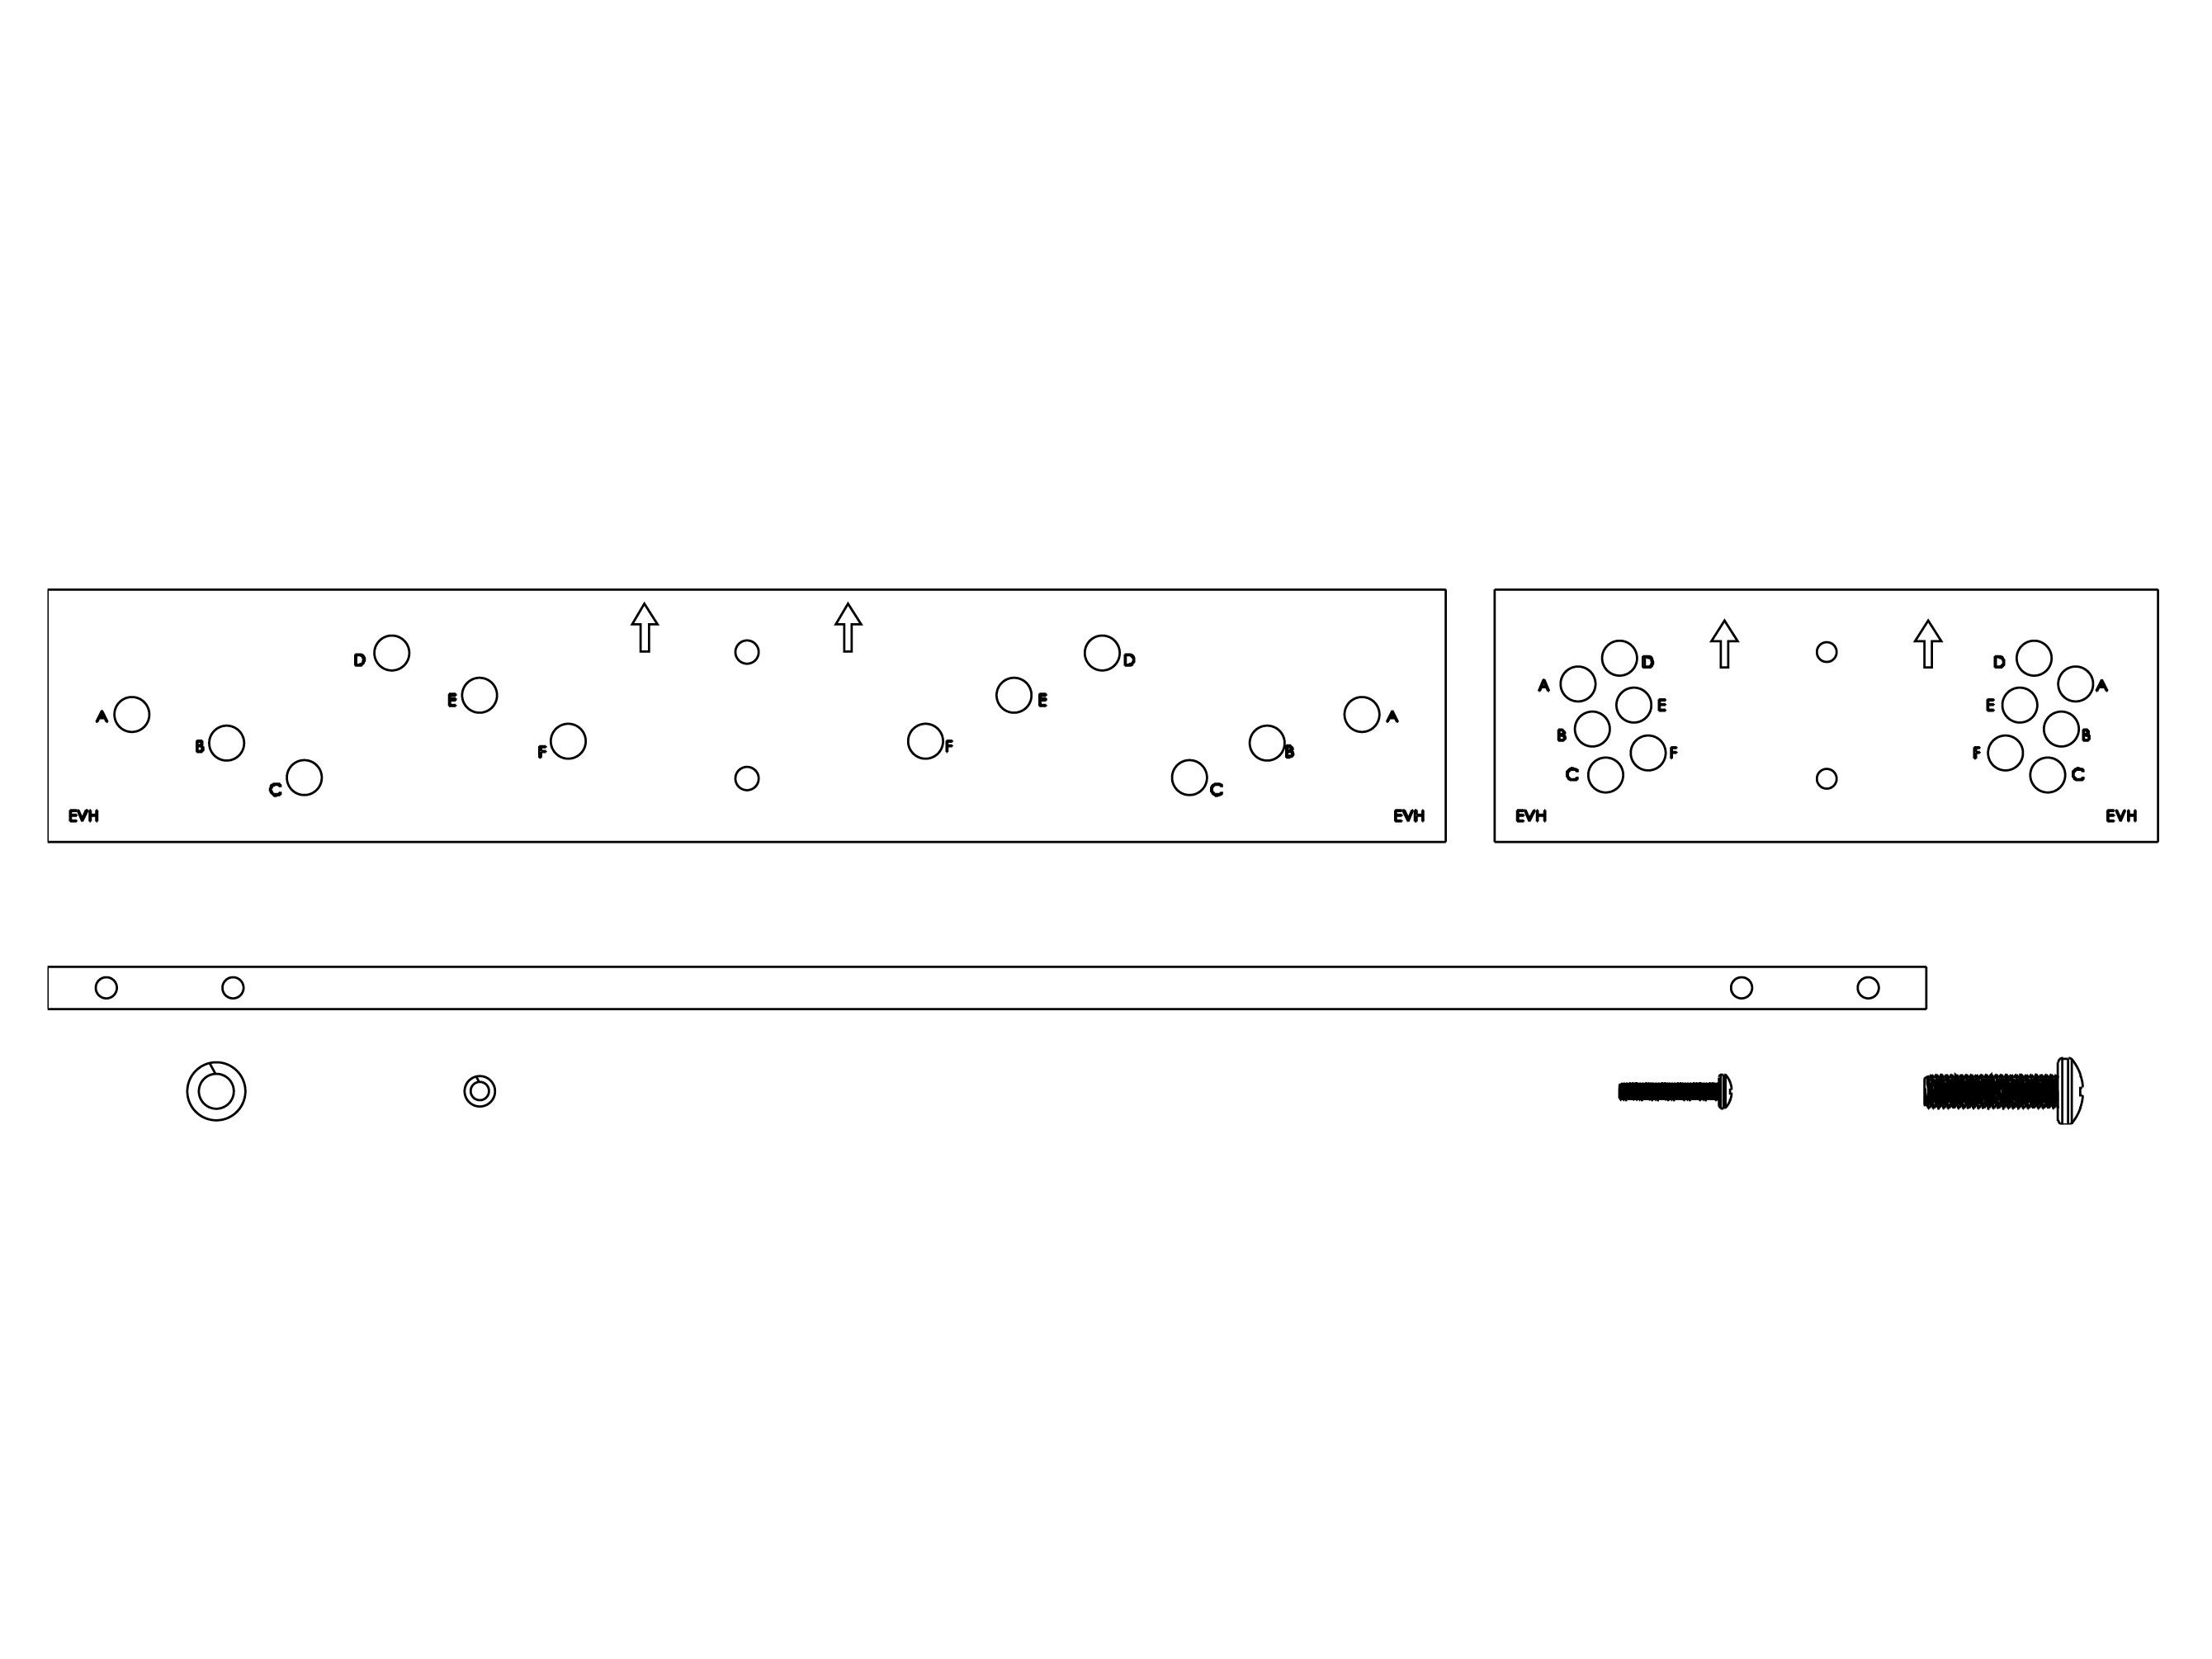 Electro-Voice VRK3B Vertical Rigging Kit for EVH/Black